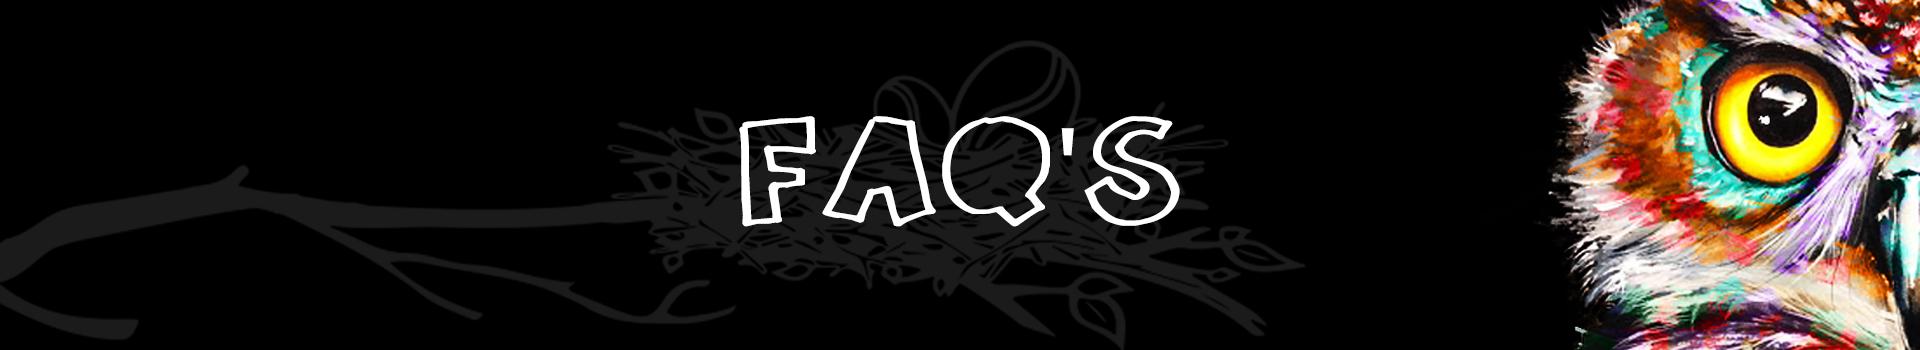 FTE_LO_FAQS